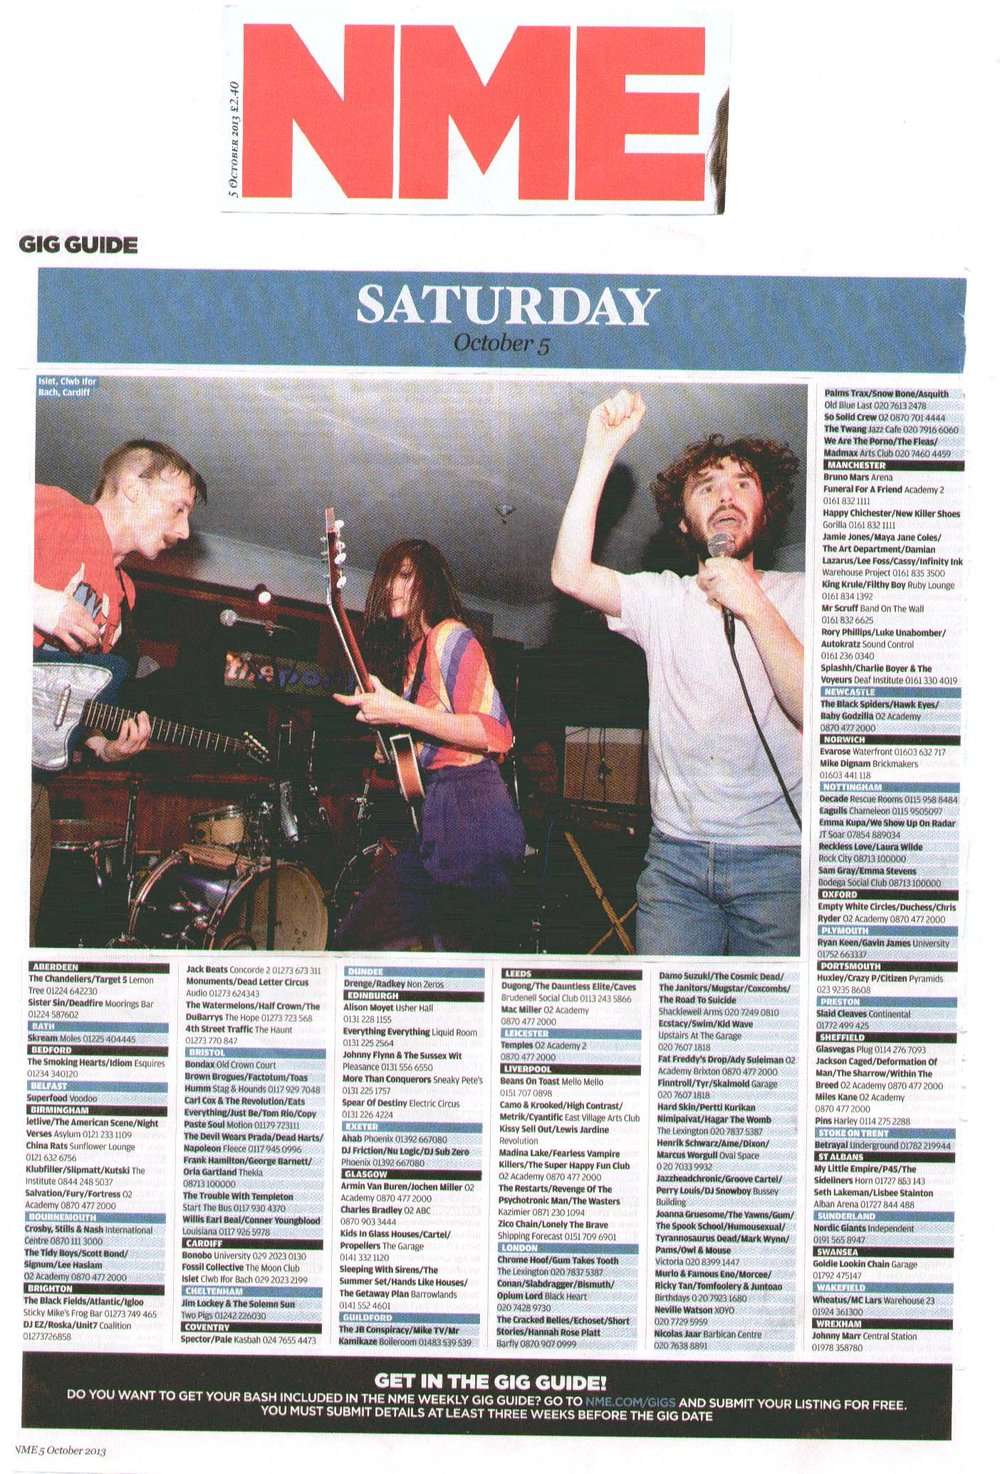 Islet NME Gig Guide.jpg